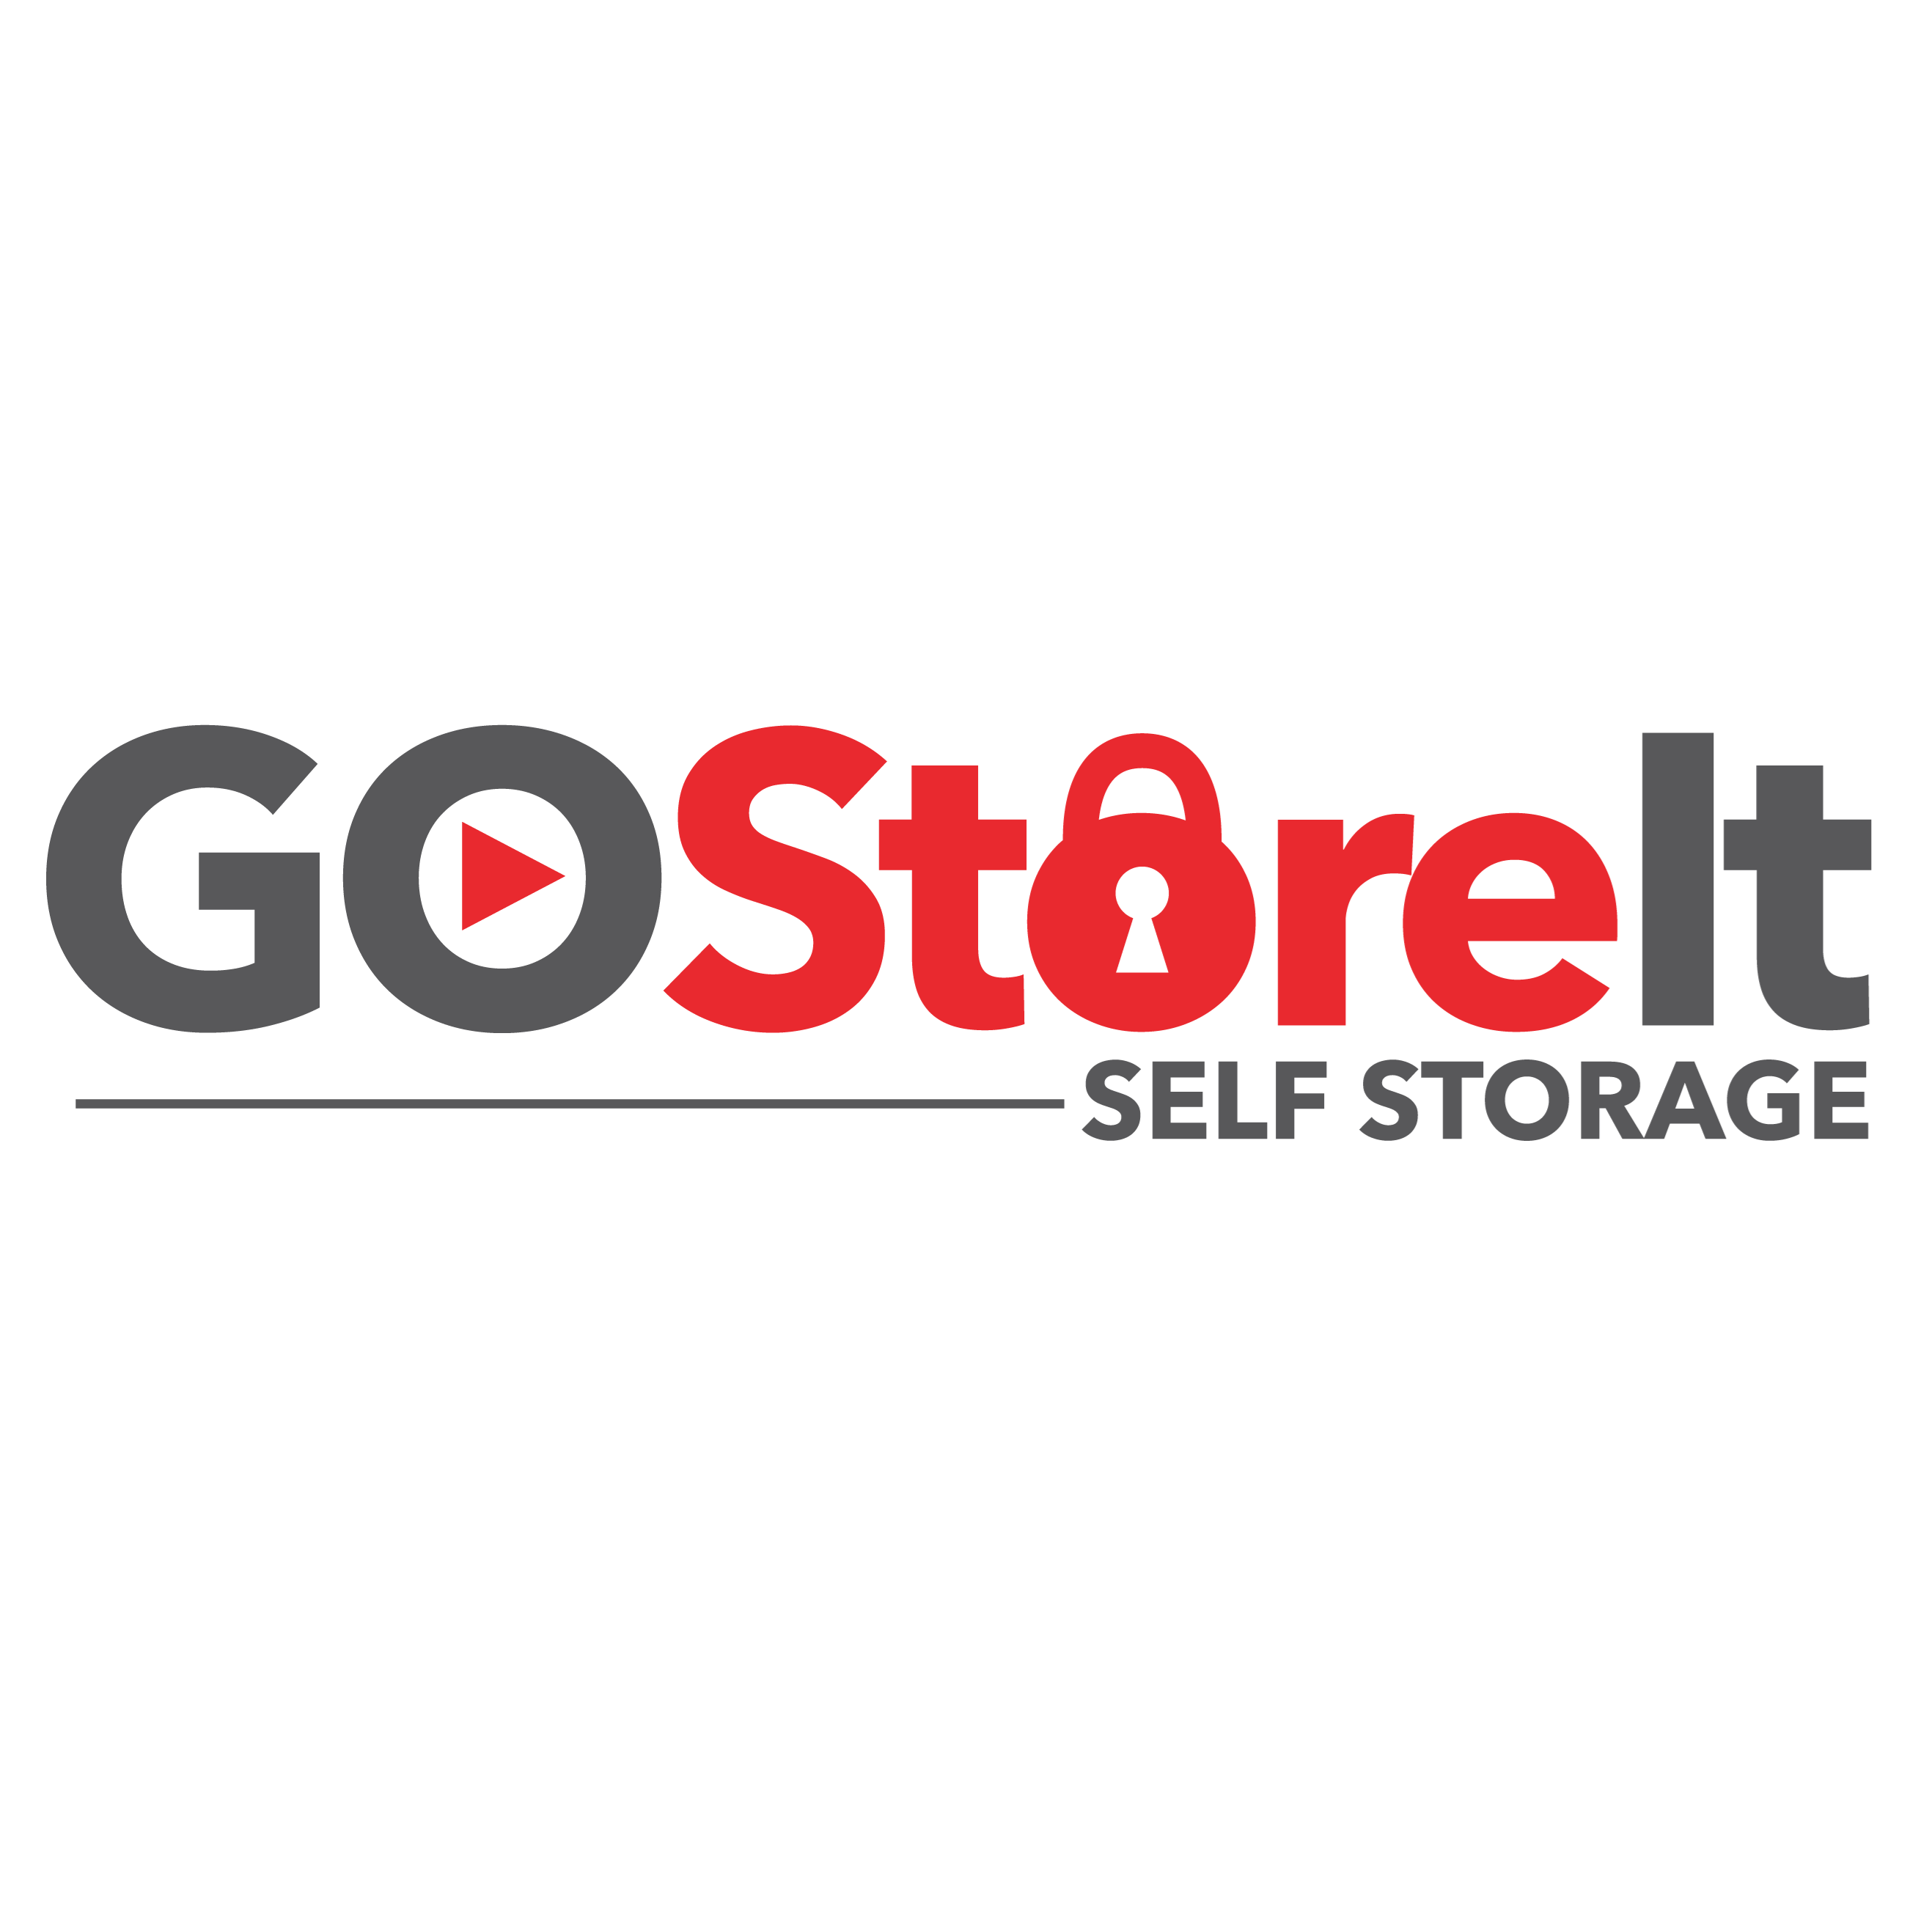 Go Store It